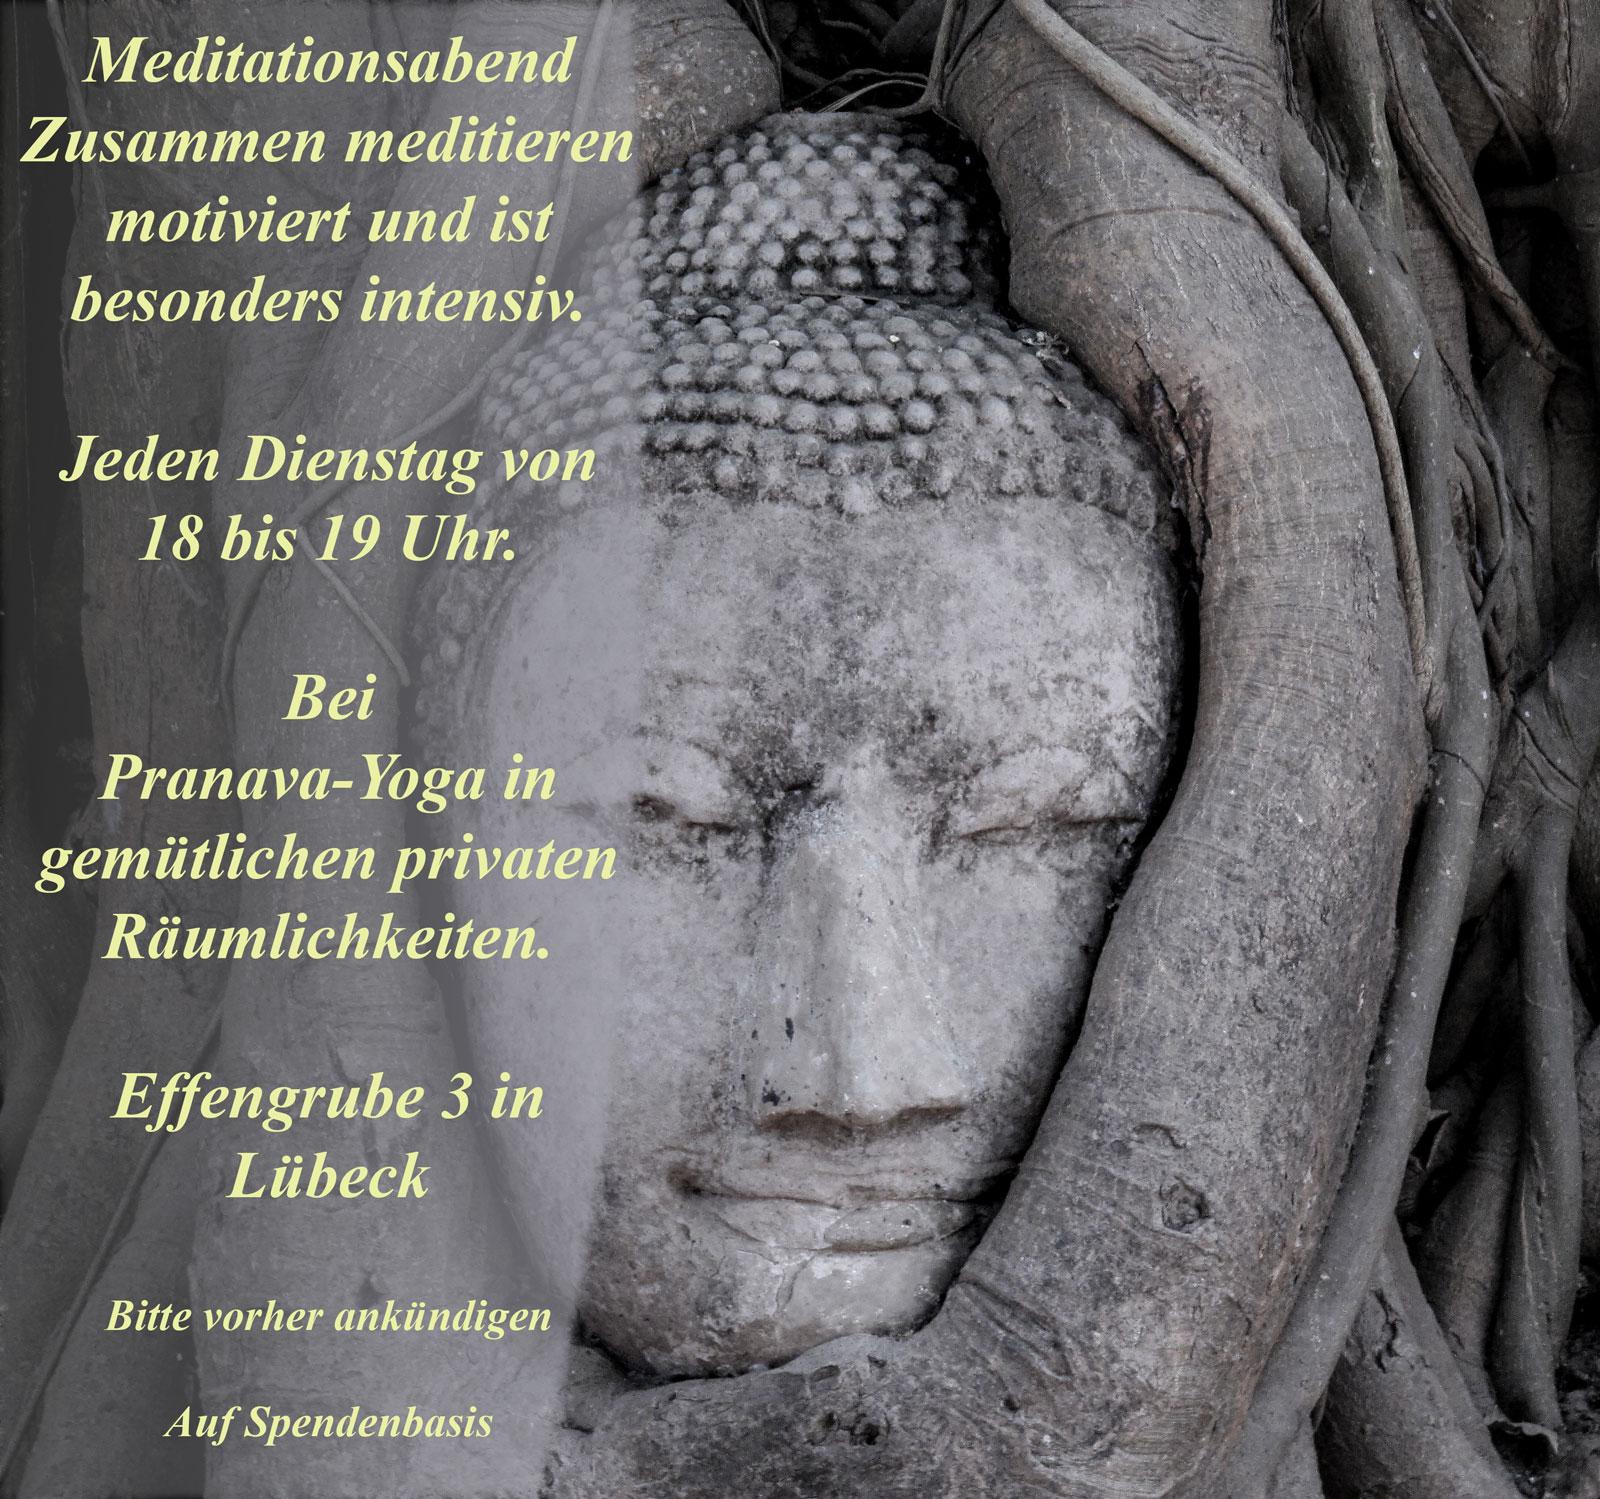 Meditationsabend-4